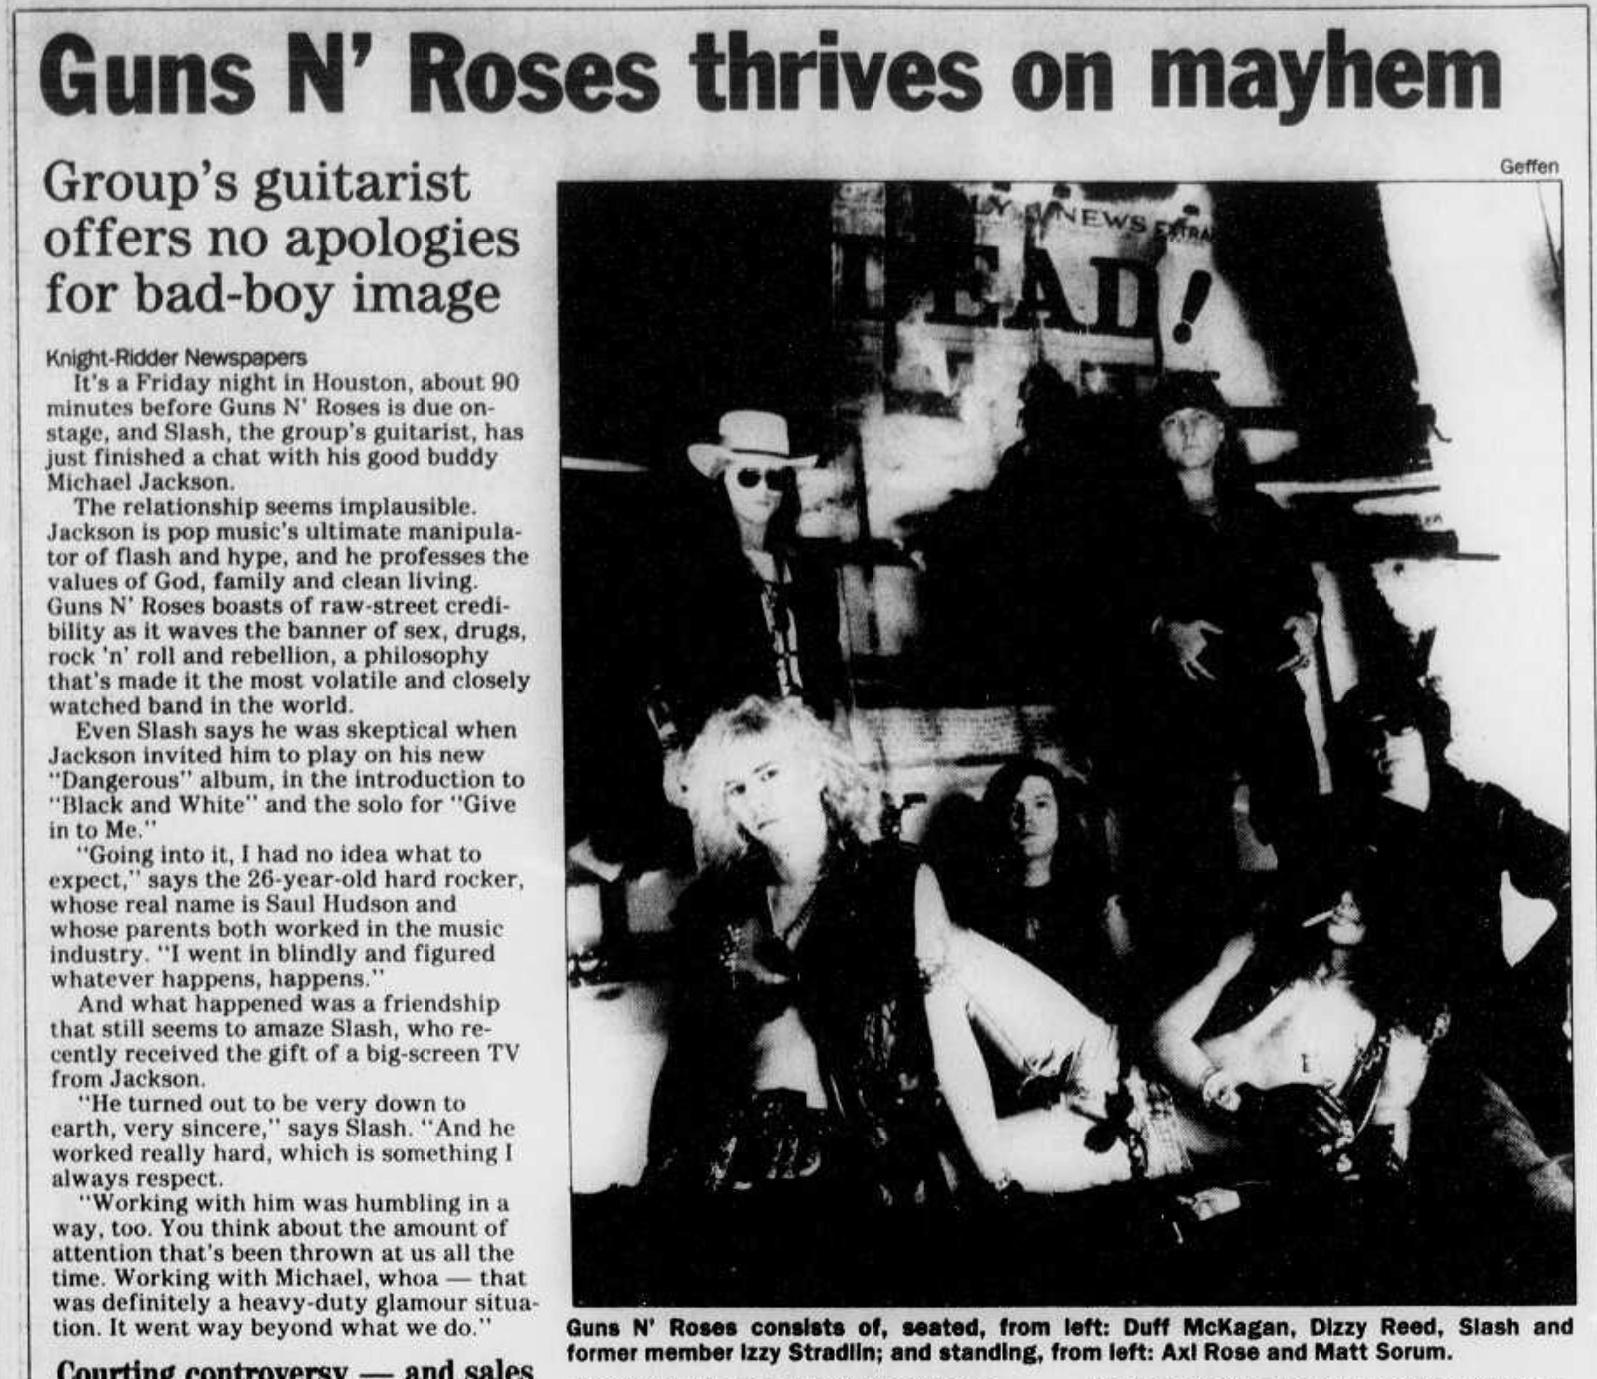 1992.04.12 - Detroit Free Press - Guns N' Roses Guitarist Cuts Right to the Heart (Slash) Colora10